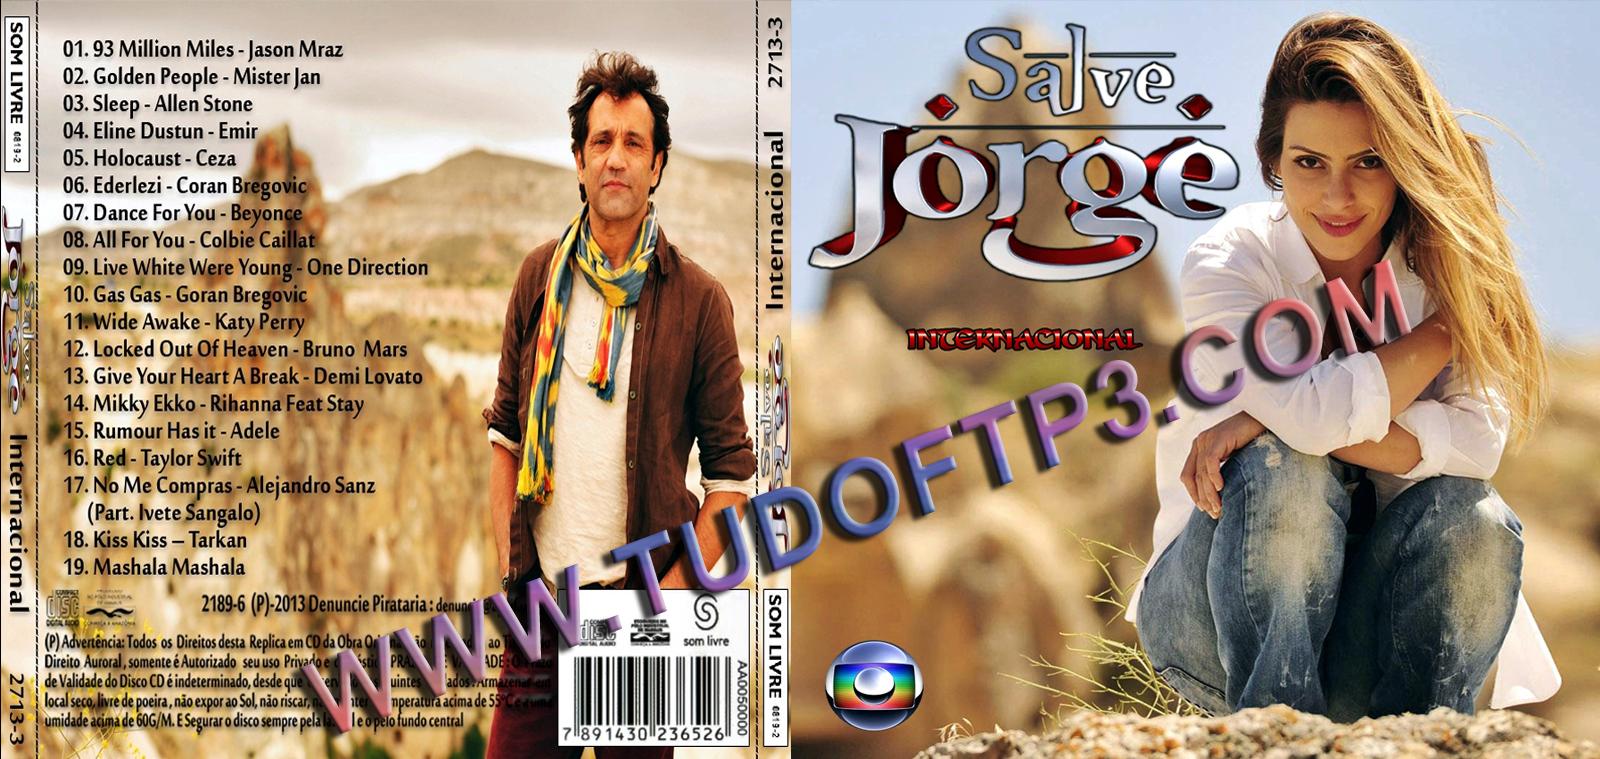 Download trilha sonora novela salve jorge volume 2 nacional.